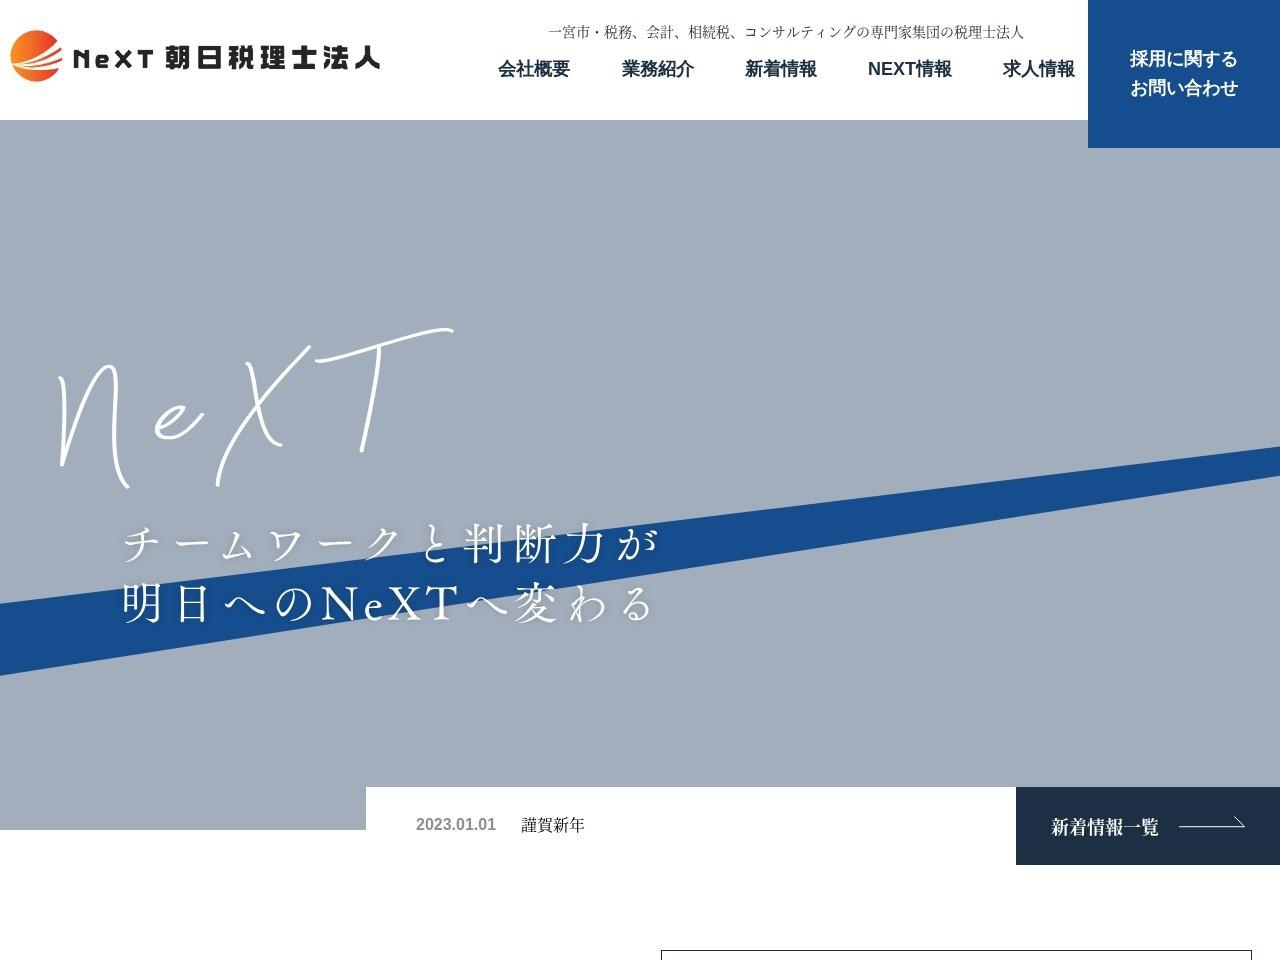 NeXT朝日(税理士法人)